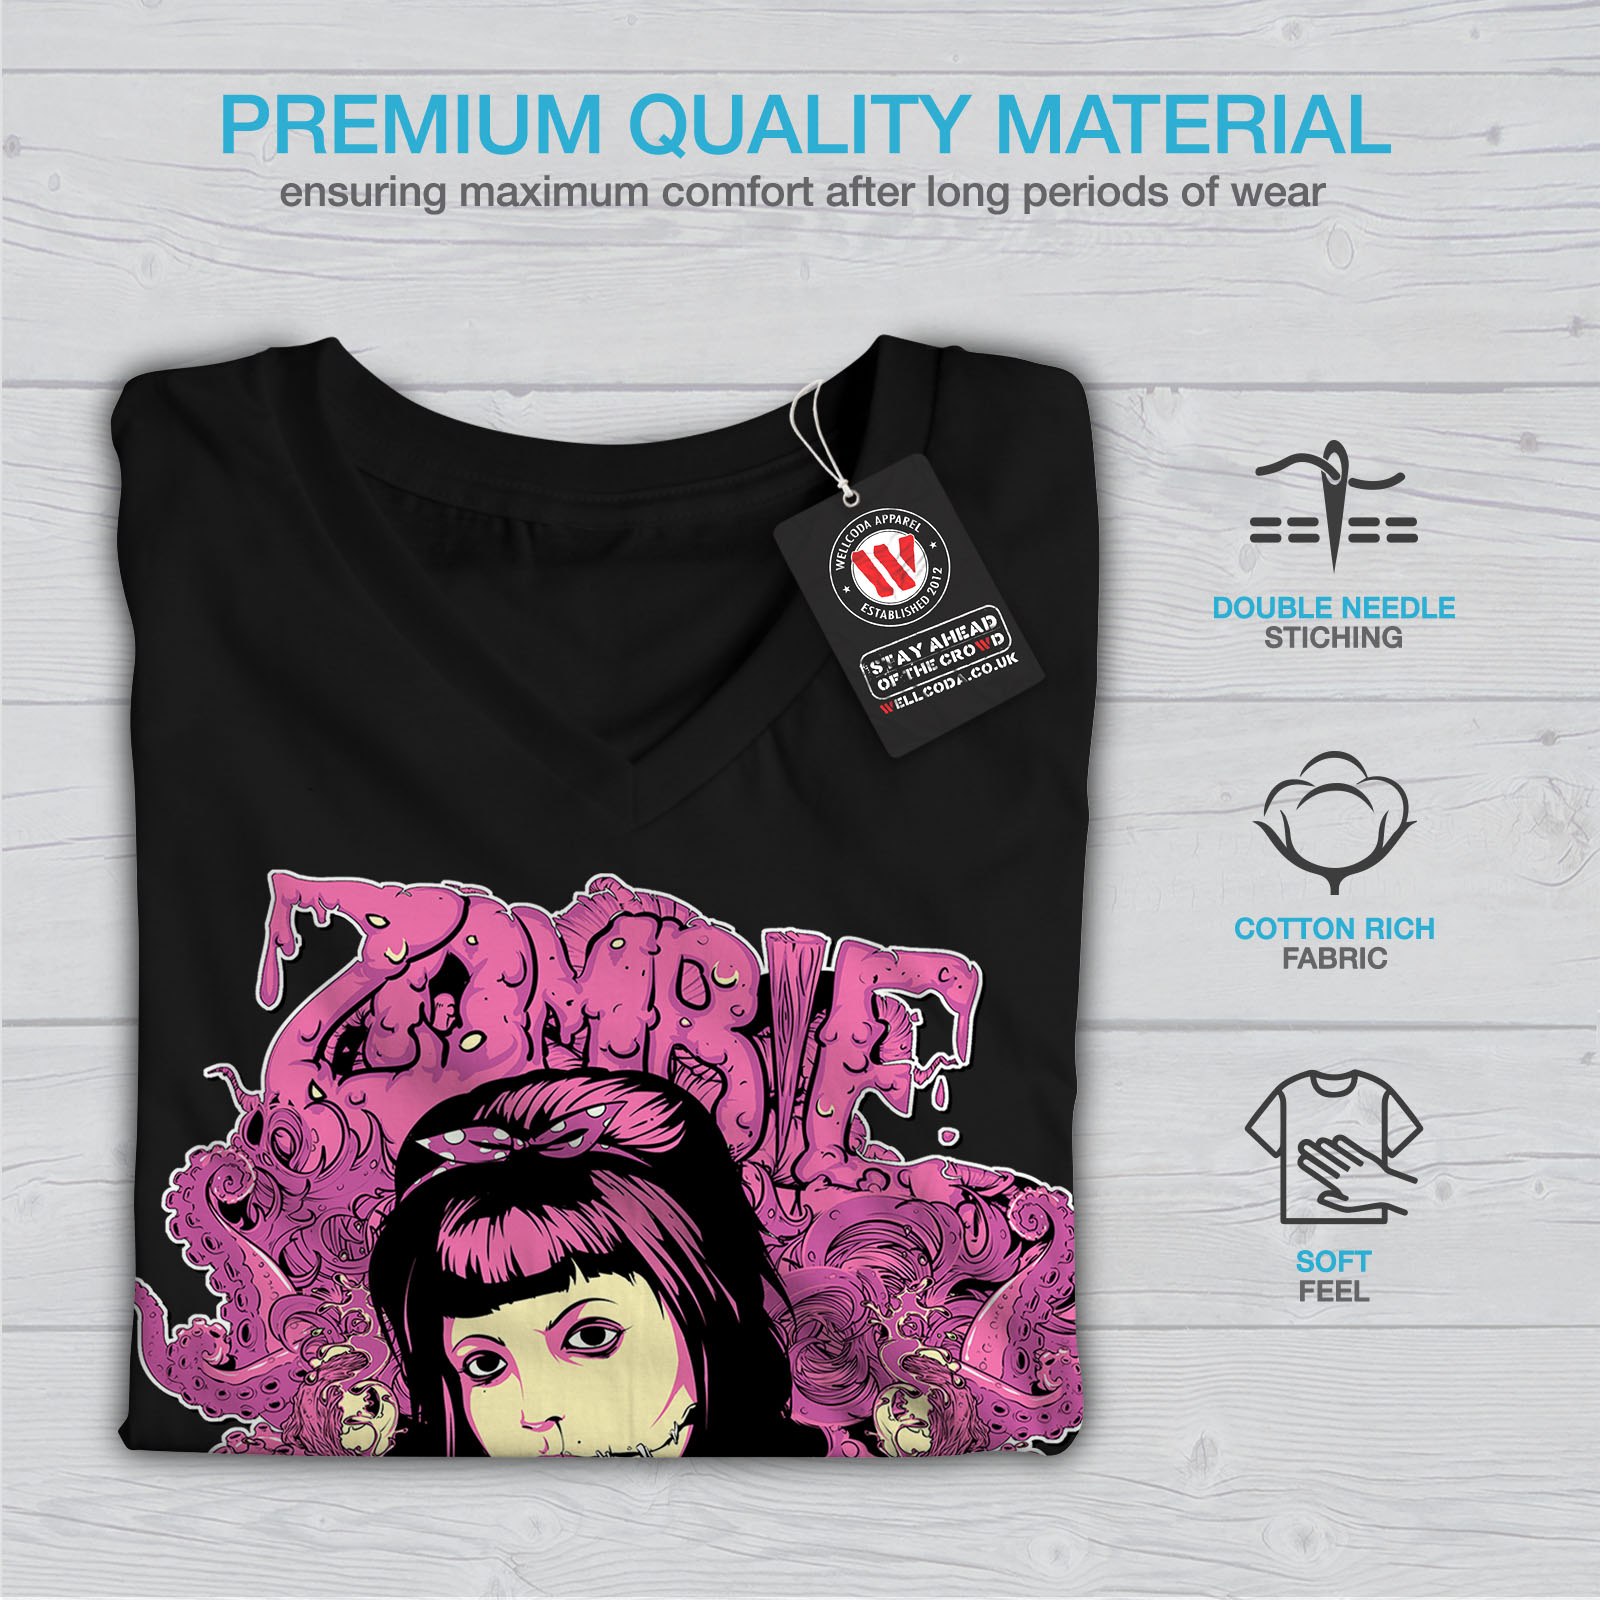 Wellcoda Undead Marionette Womens V-Neck T-shirt Creepy Graphic Design Tee